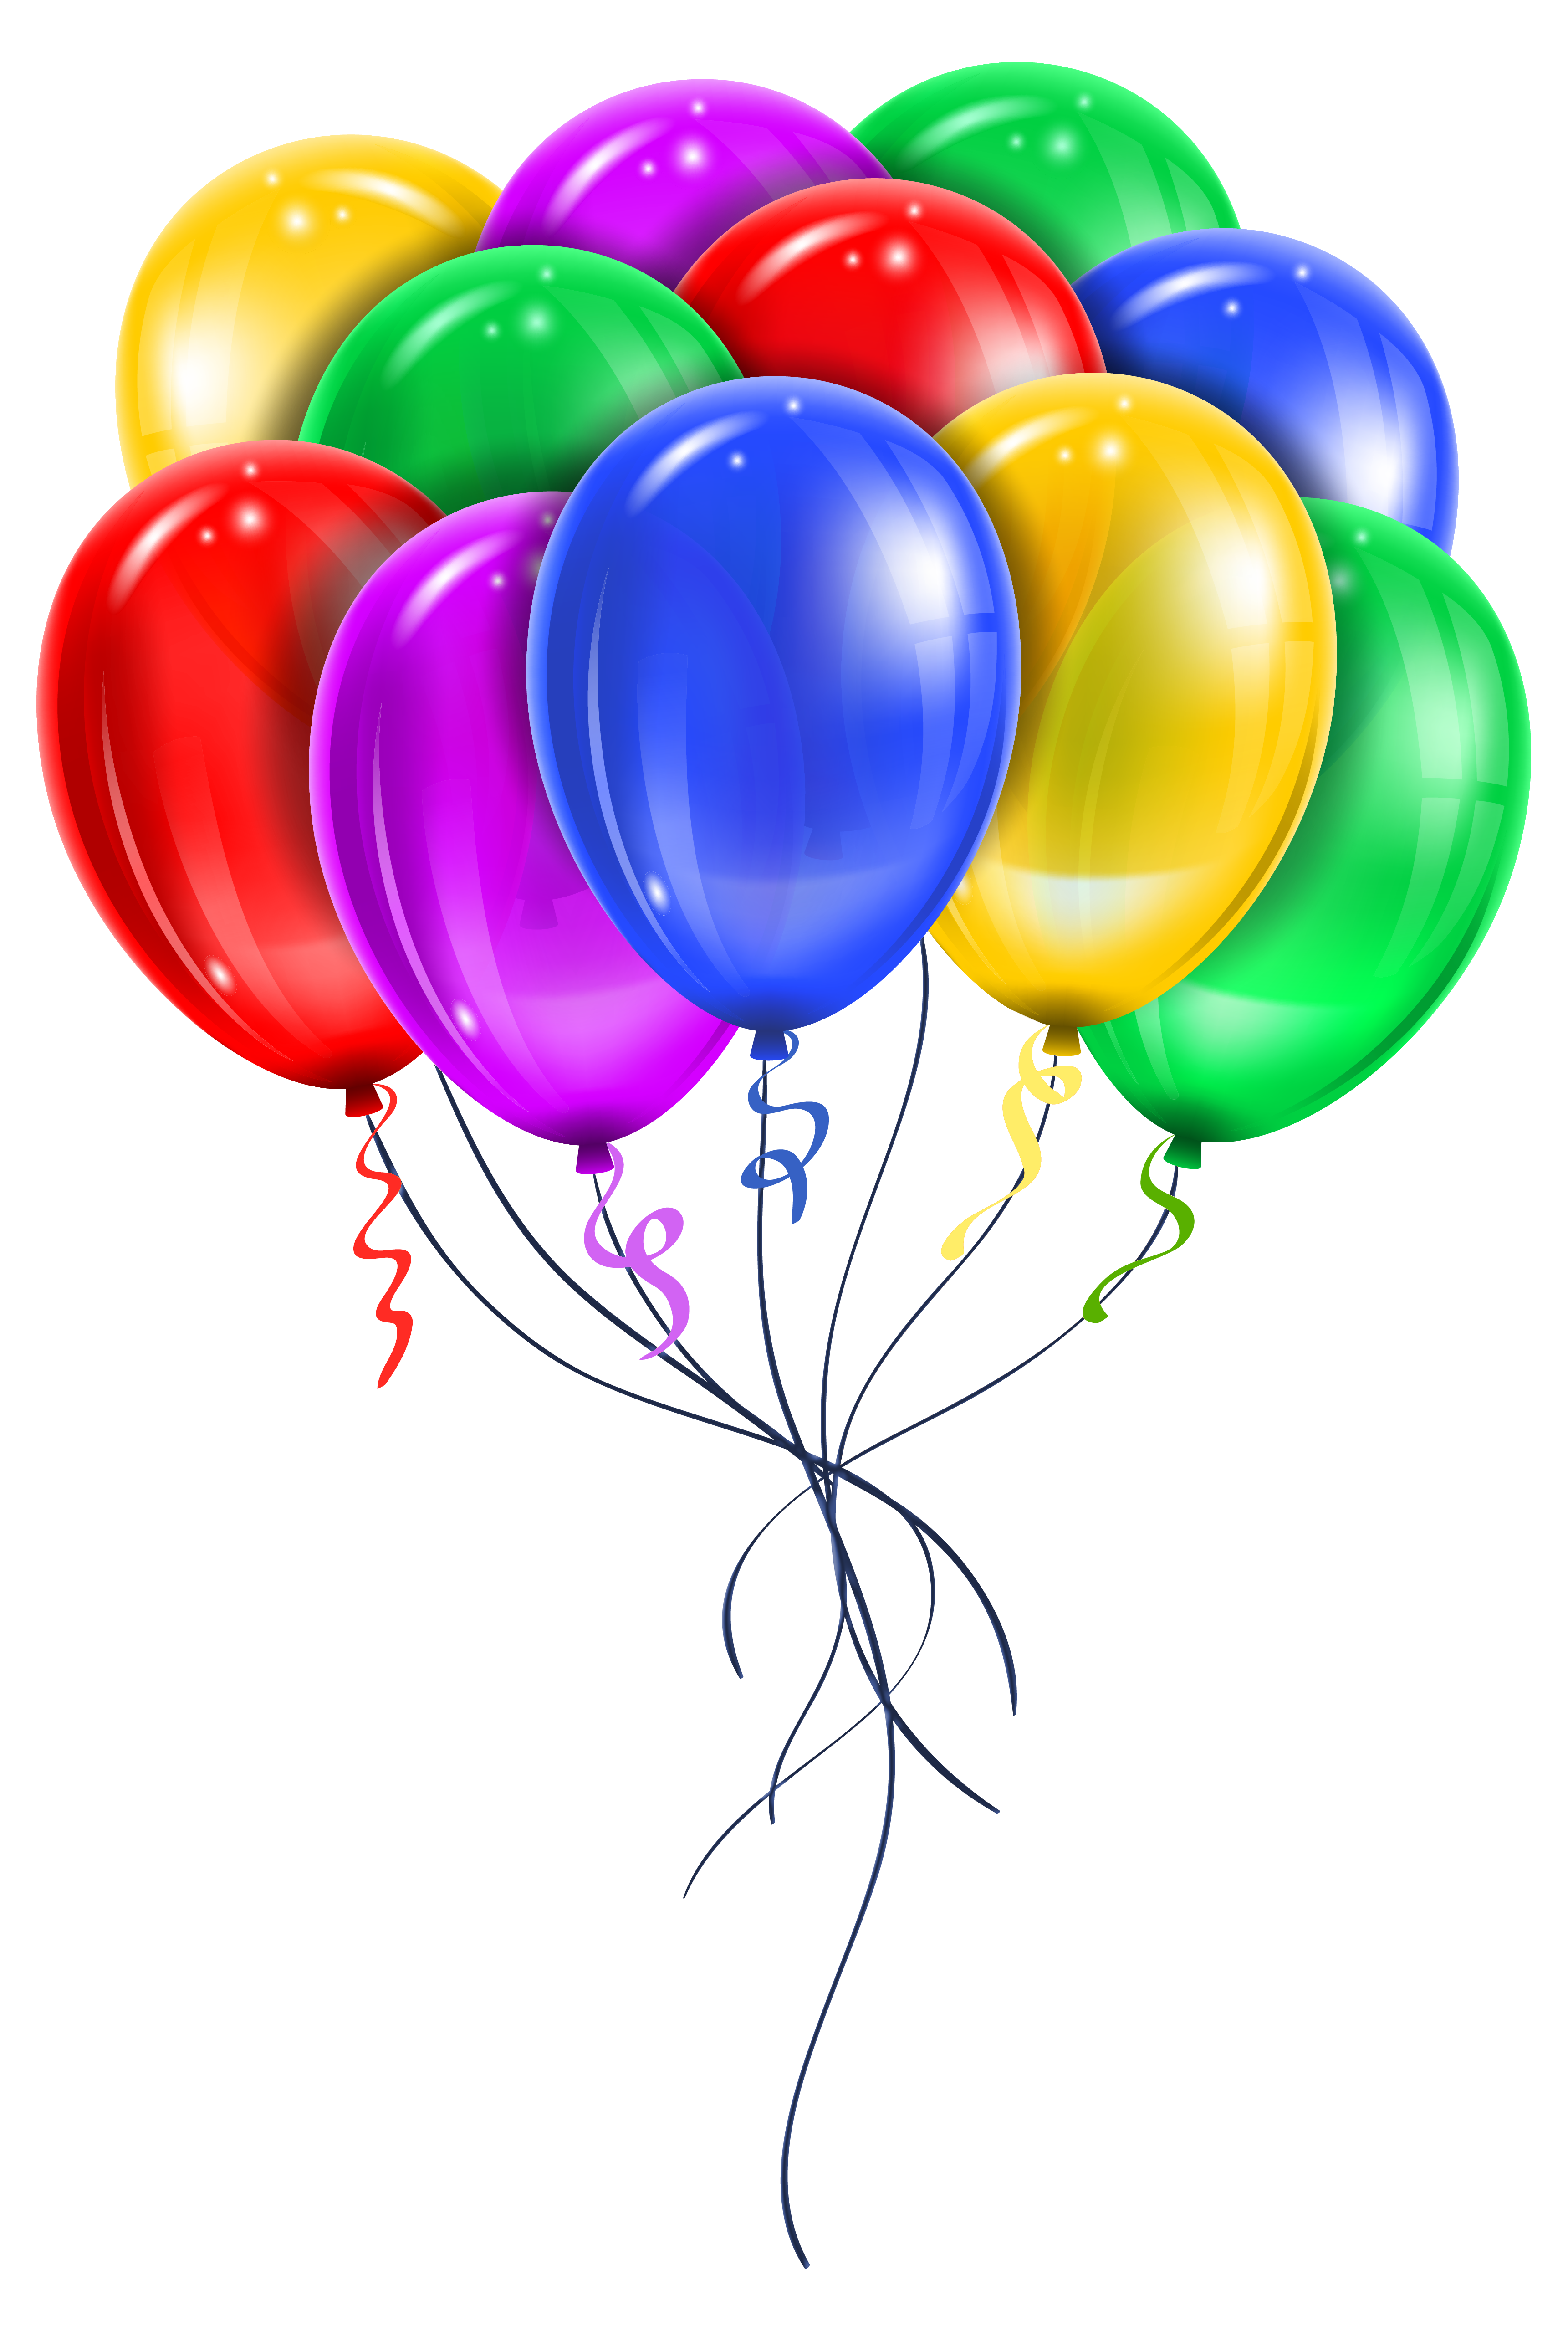 Balloons Transparent Png image #28085 - Ballons PNG